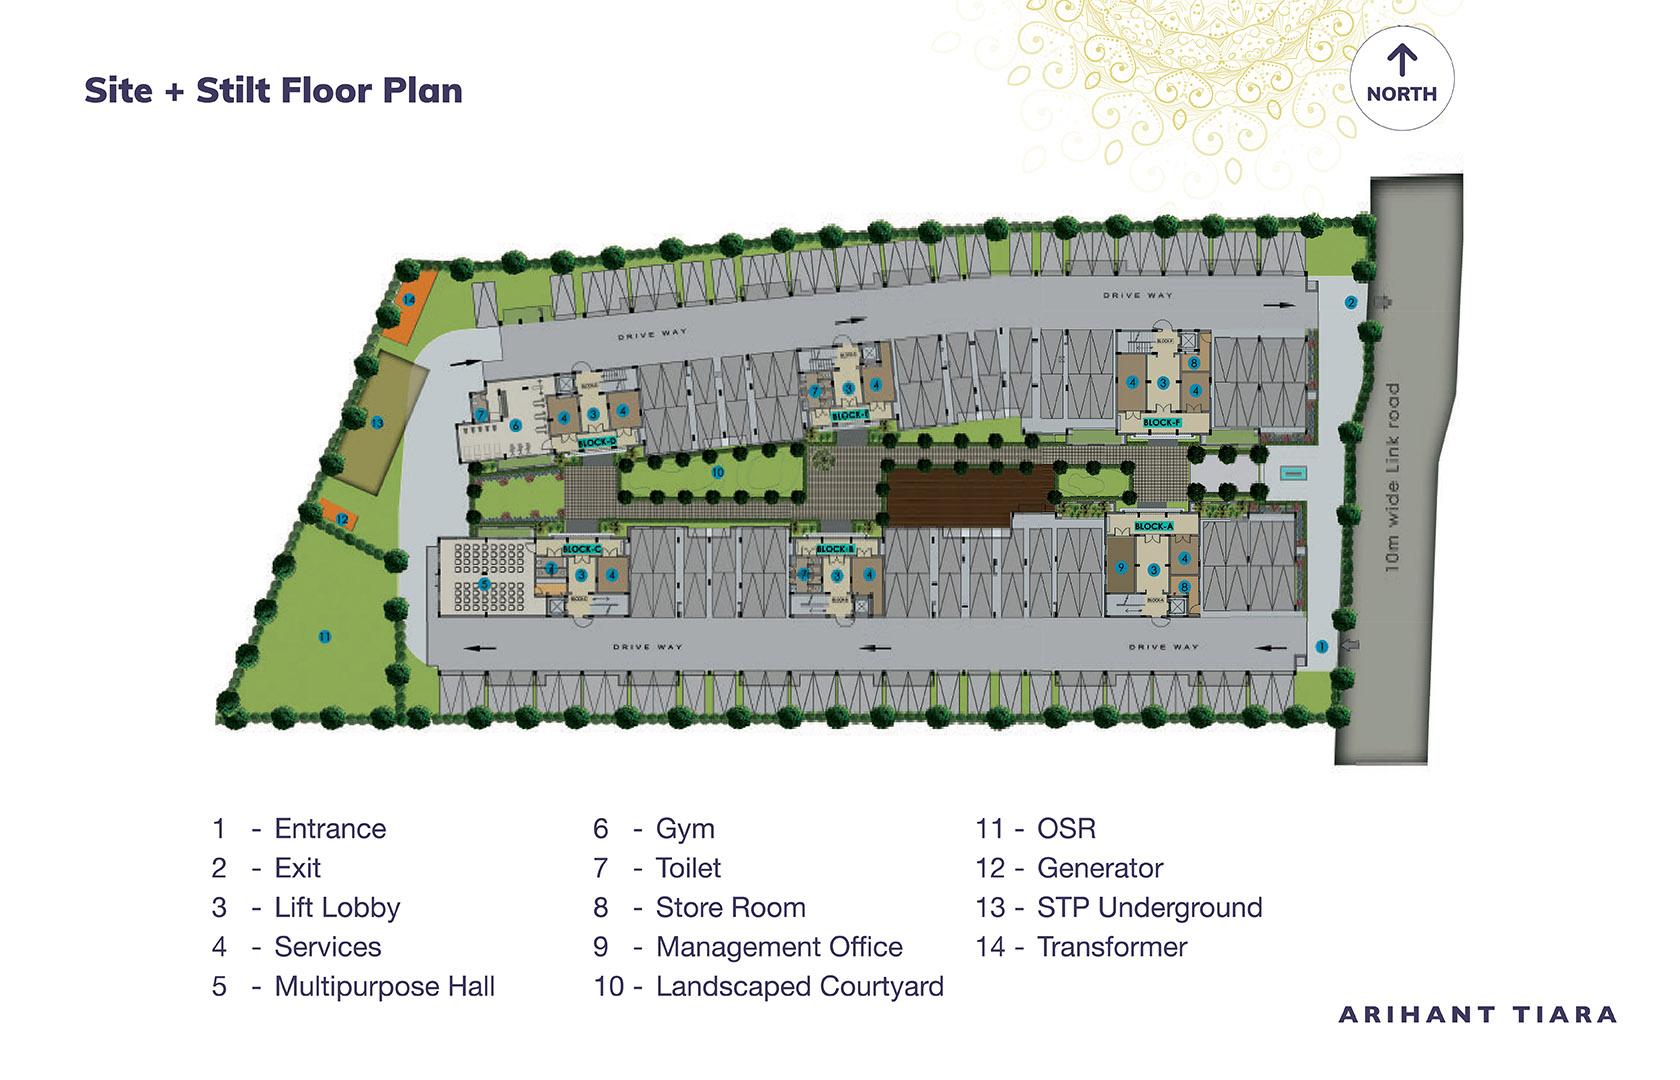 Arihant-Tiara-Chennai-Site-Plan